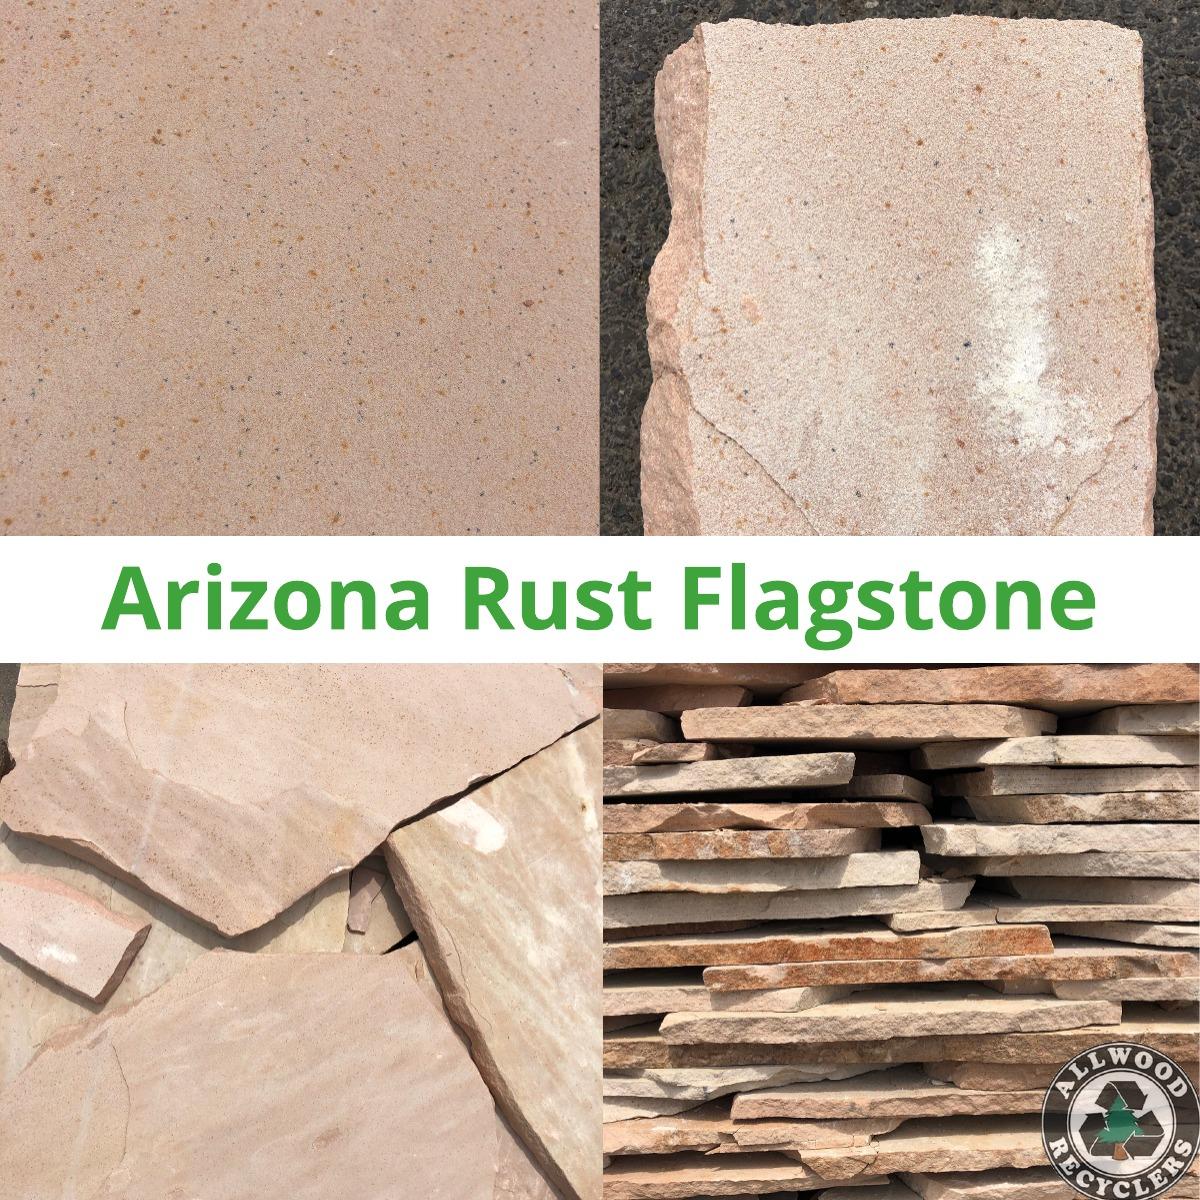 Arizona Rust Flagstone